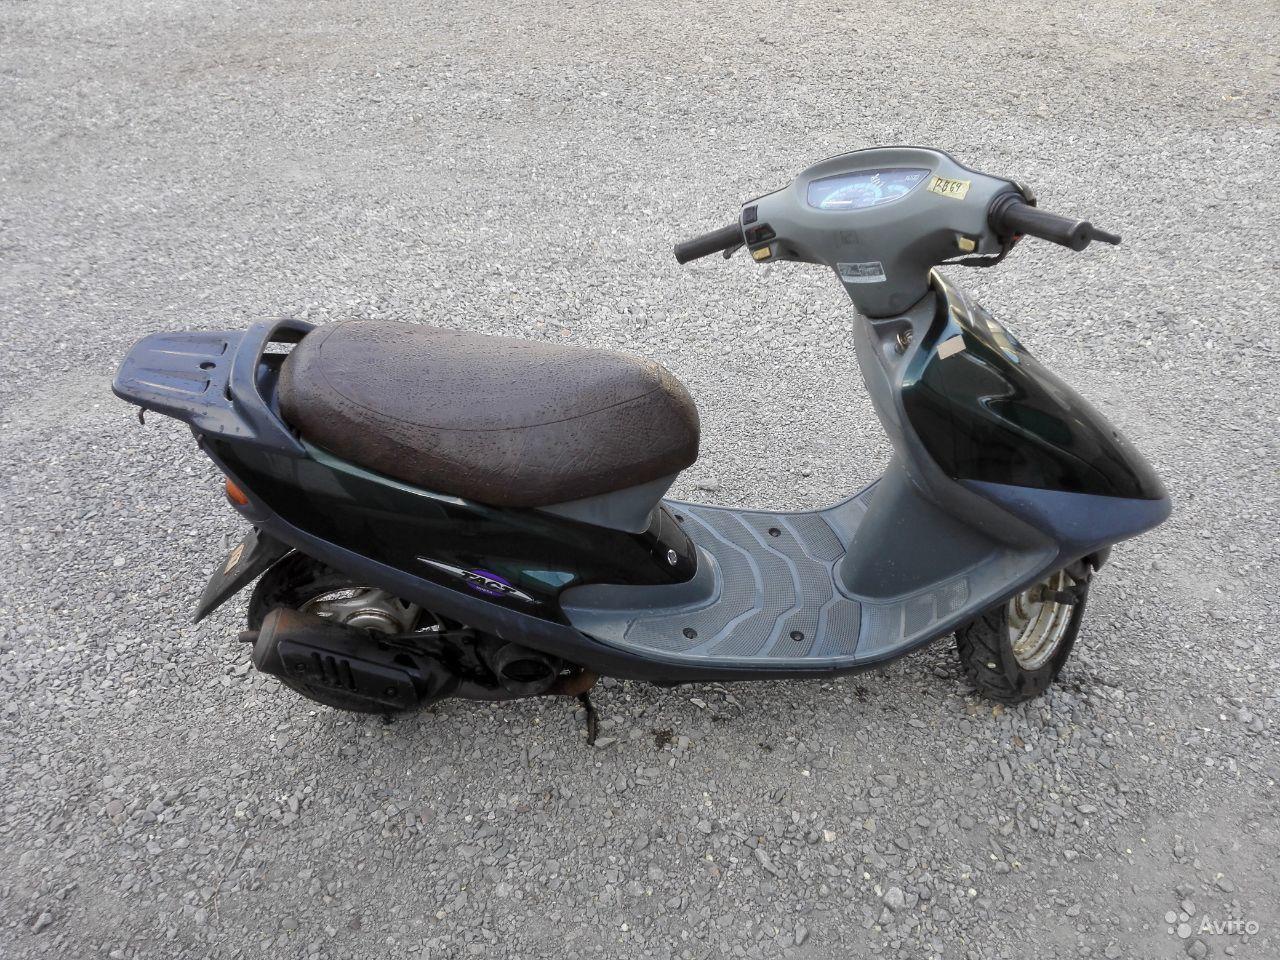 Руководство для скутера Honda Tact 30 модификации SZ50ST